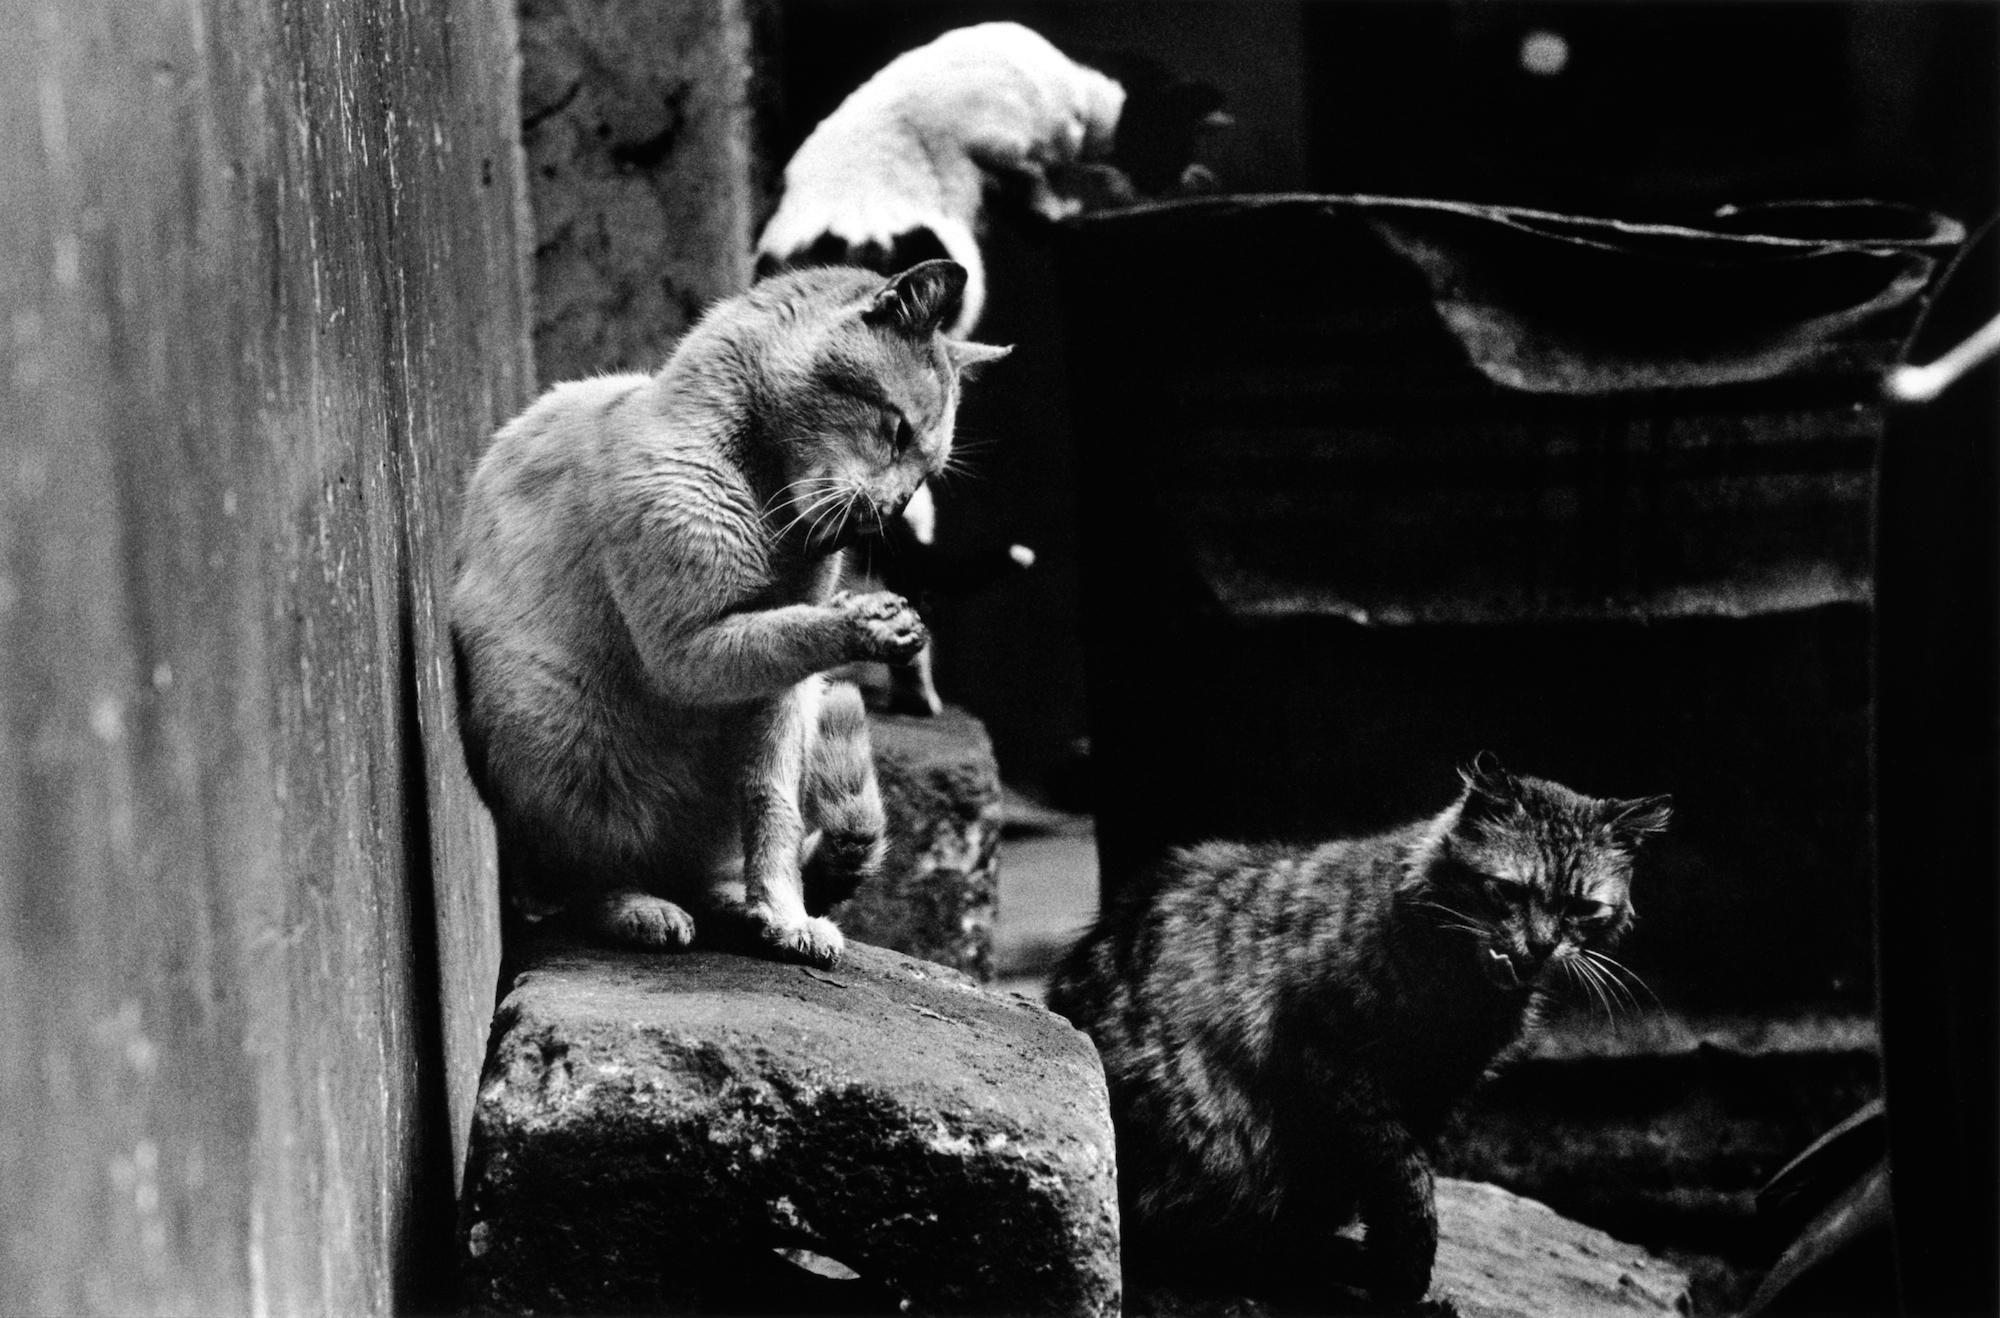 walter_rothwell_photography_cats-011.jpg